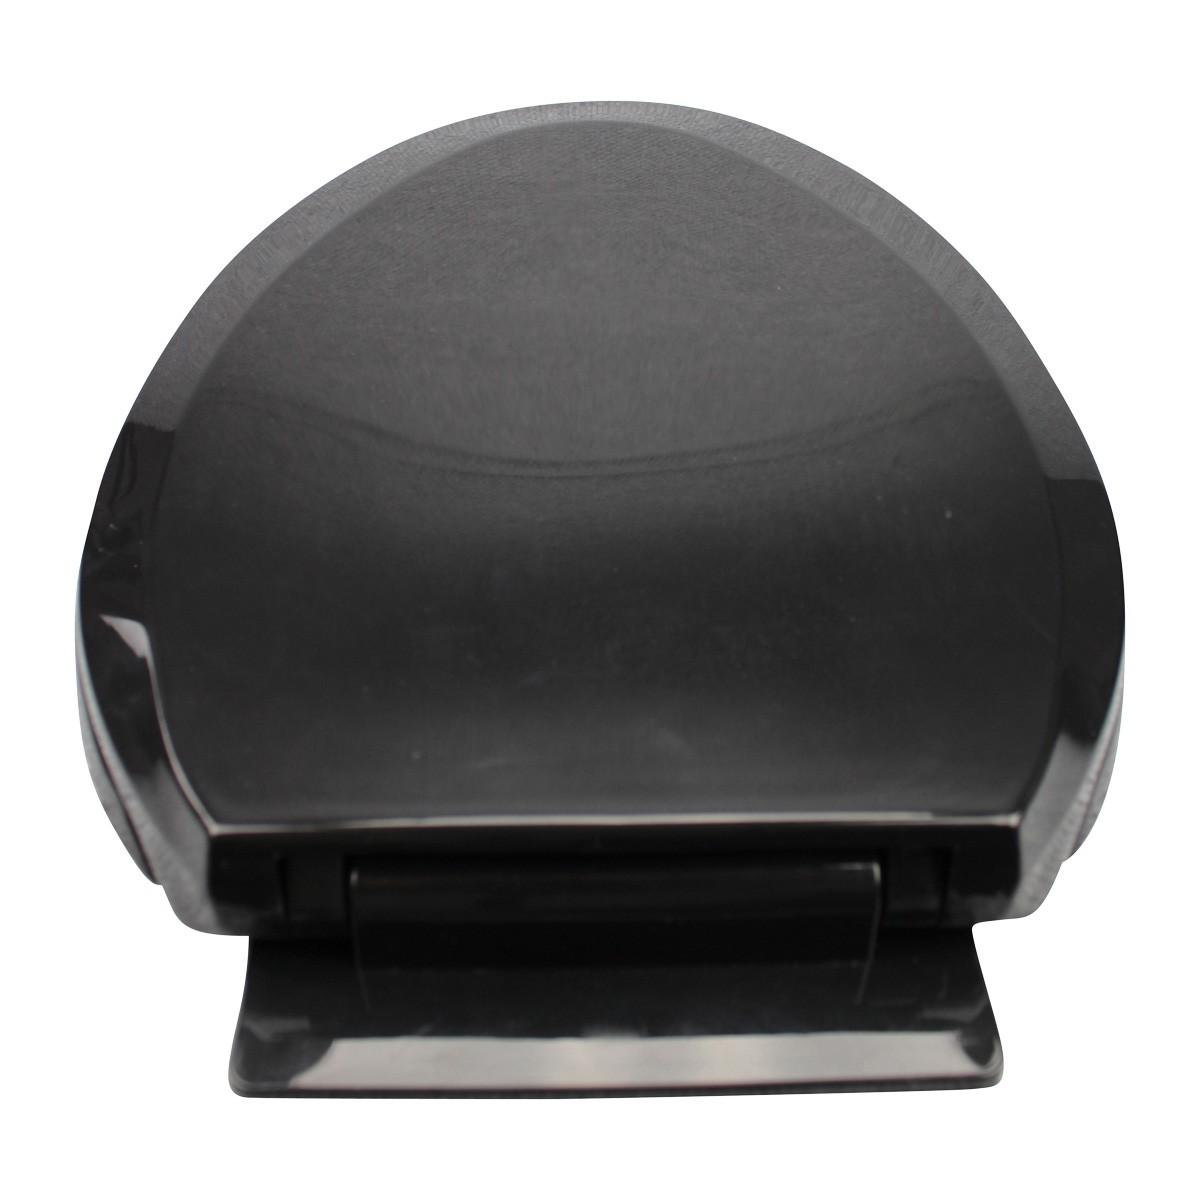 4 No Slam Toilet Seat Easy Close Black Plastic Elongated Toilet Seat Black Toilet Seat Elongated Toilet Seat